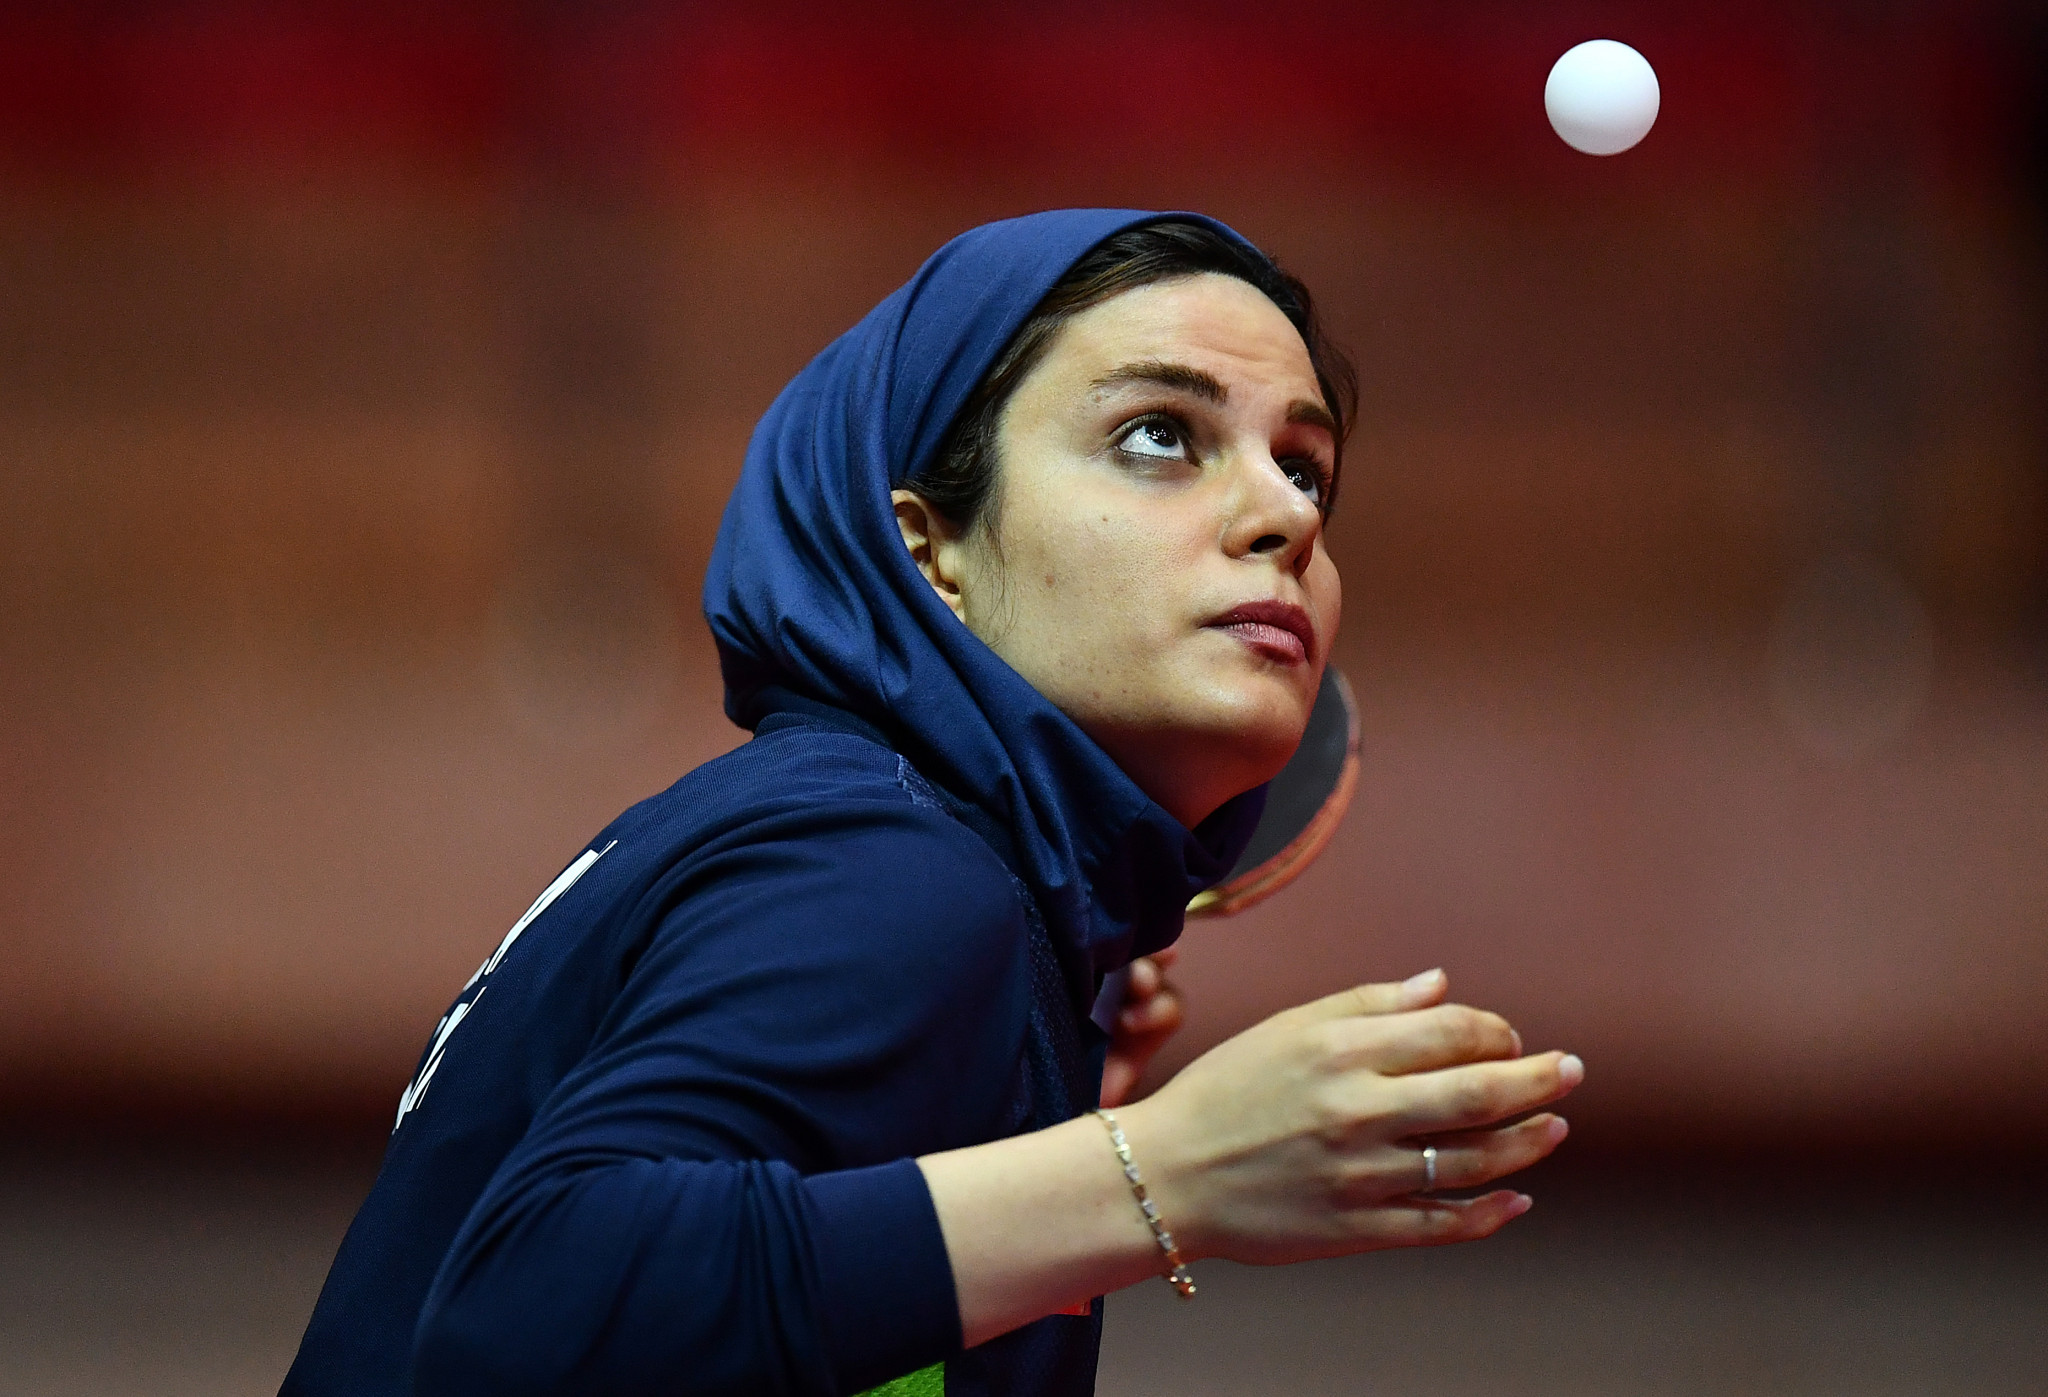 Iran's Shahsavari makes strong start at Asian Olympic Qualification table tennis in Doha